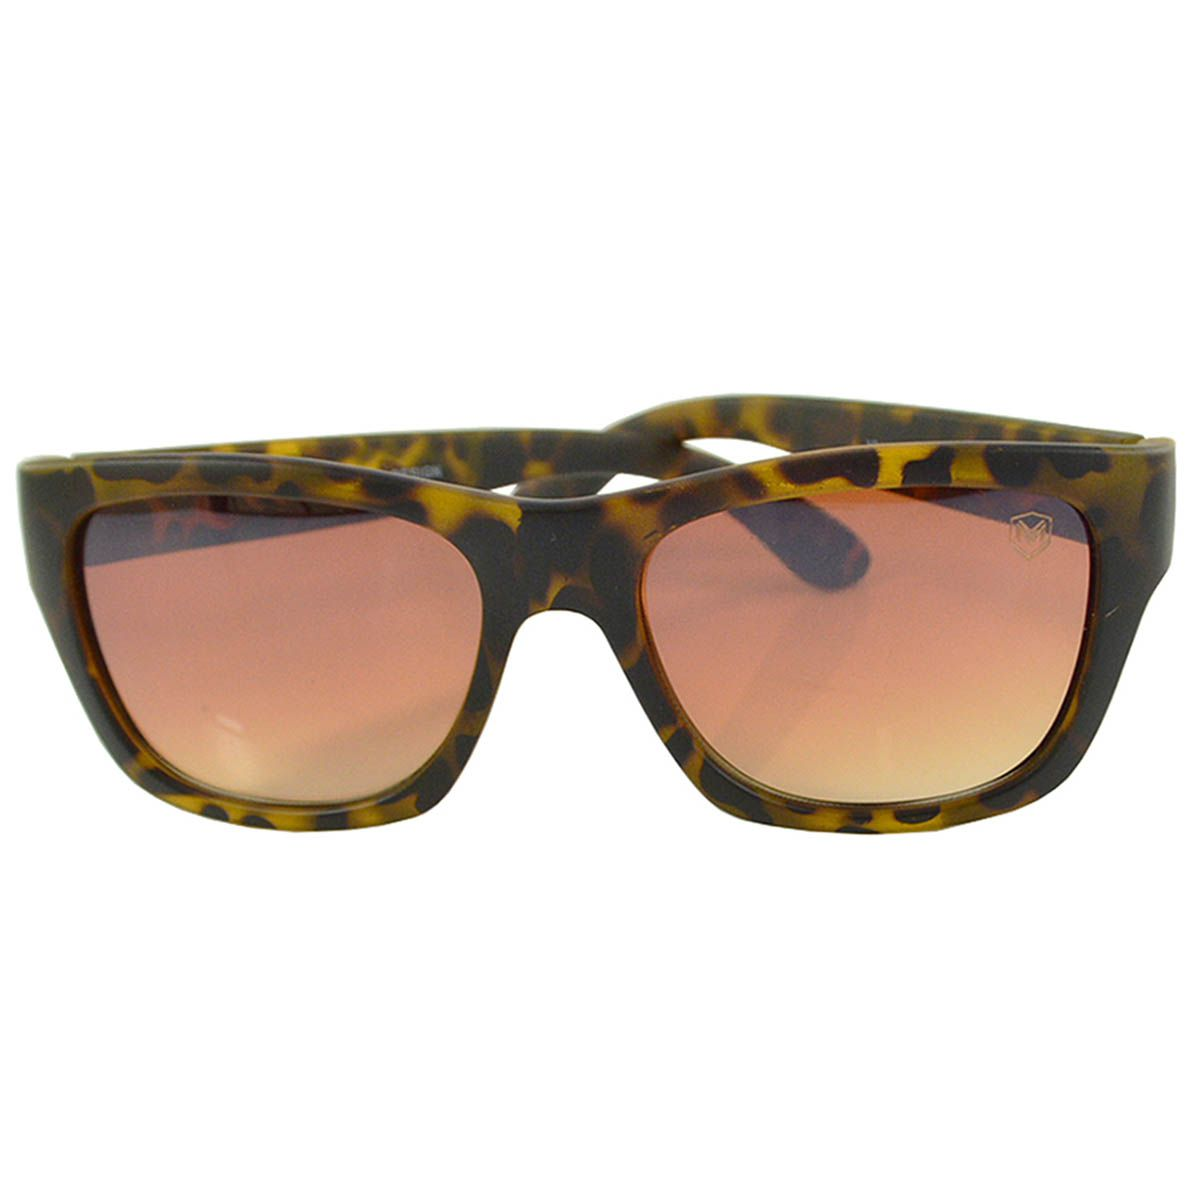 Óculos de Sol Mackage Unissex Acetato Retangular Retrô - Tartaruga